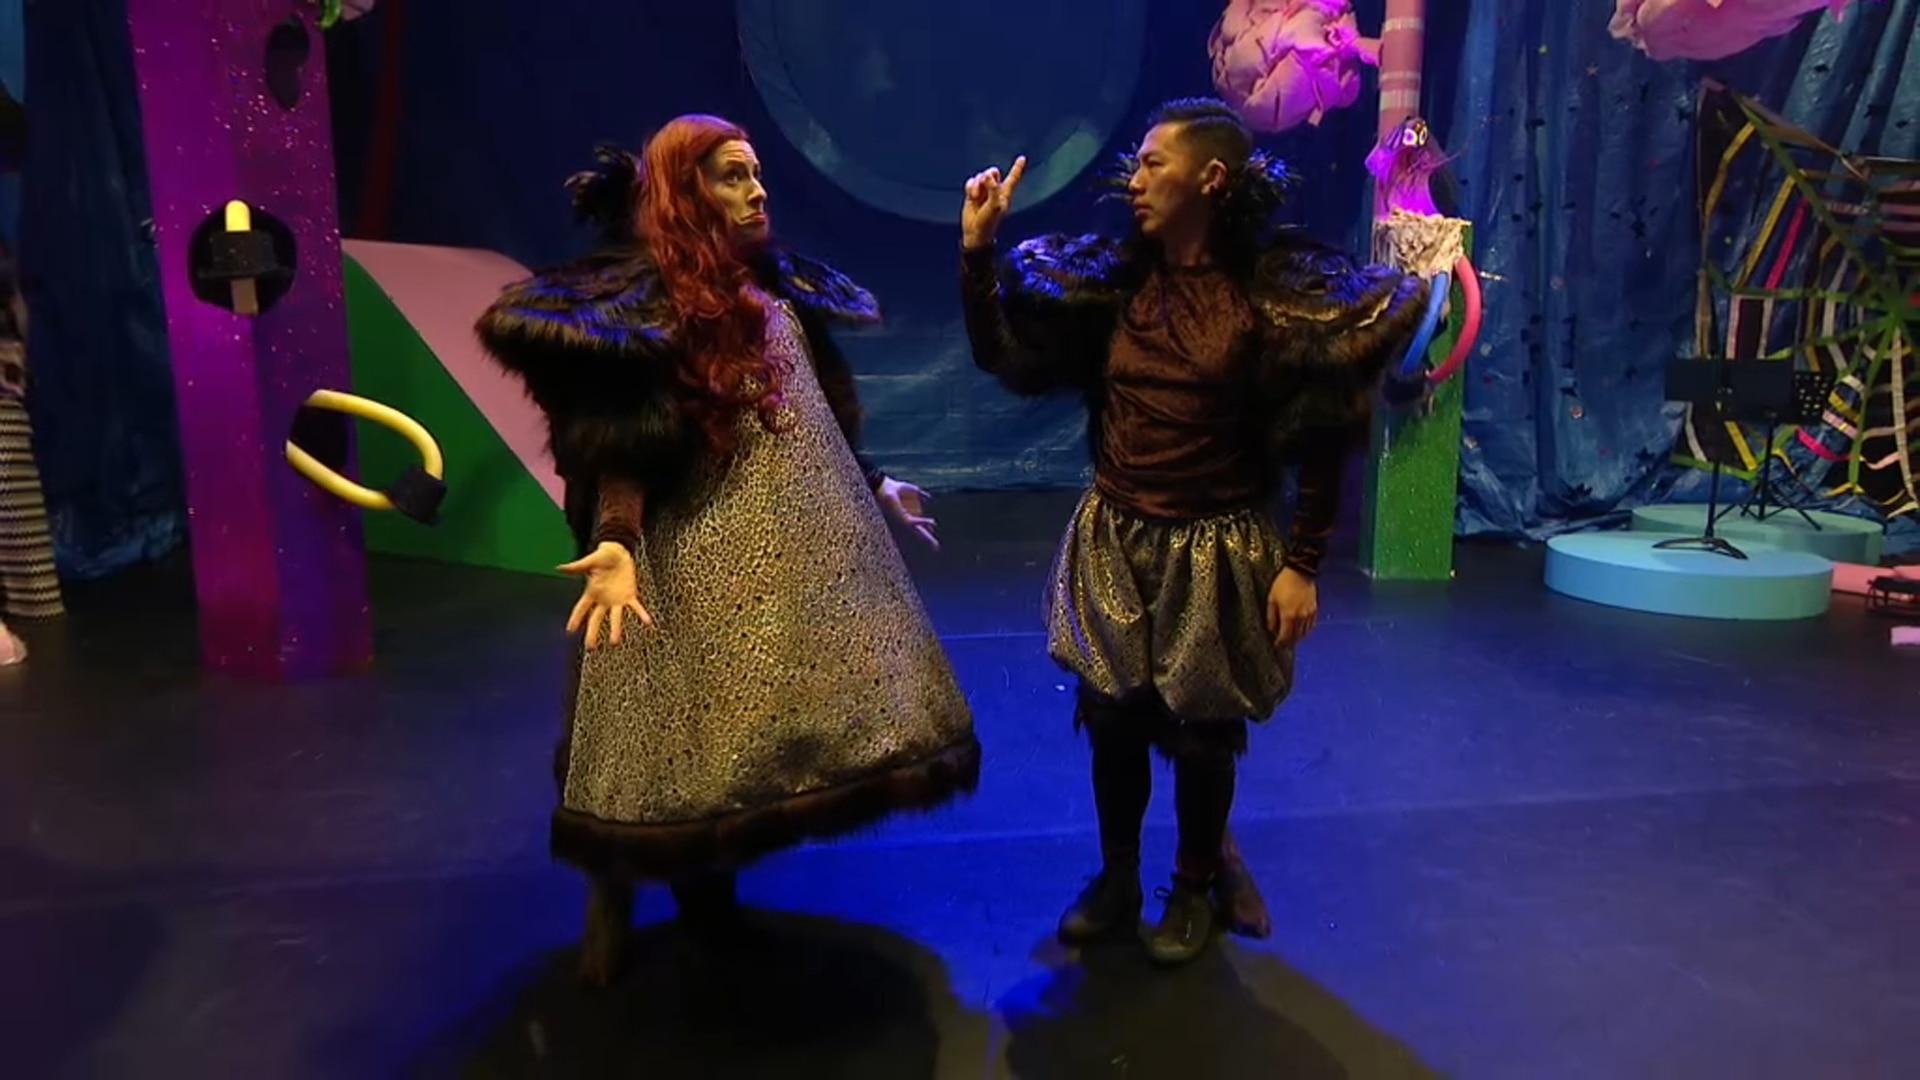 Performers Emma Watkins and Elvin Lam.